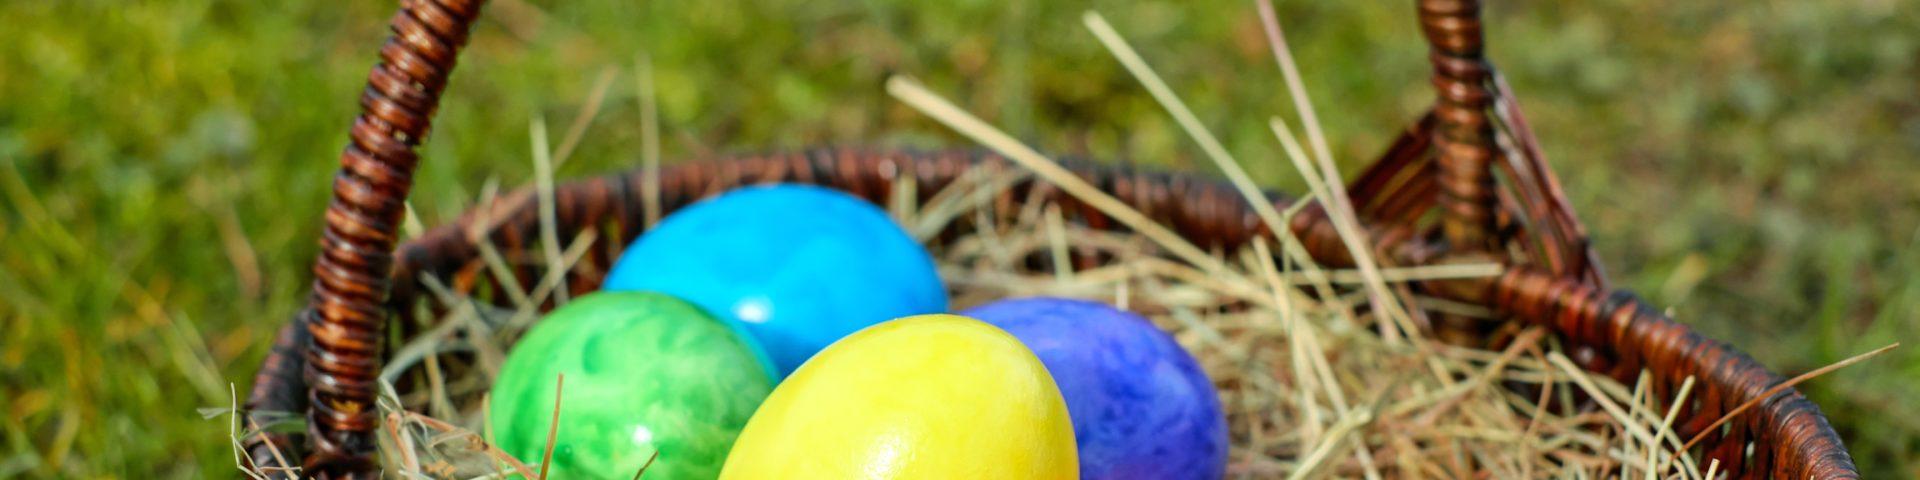 Easter egg orienteering hunt